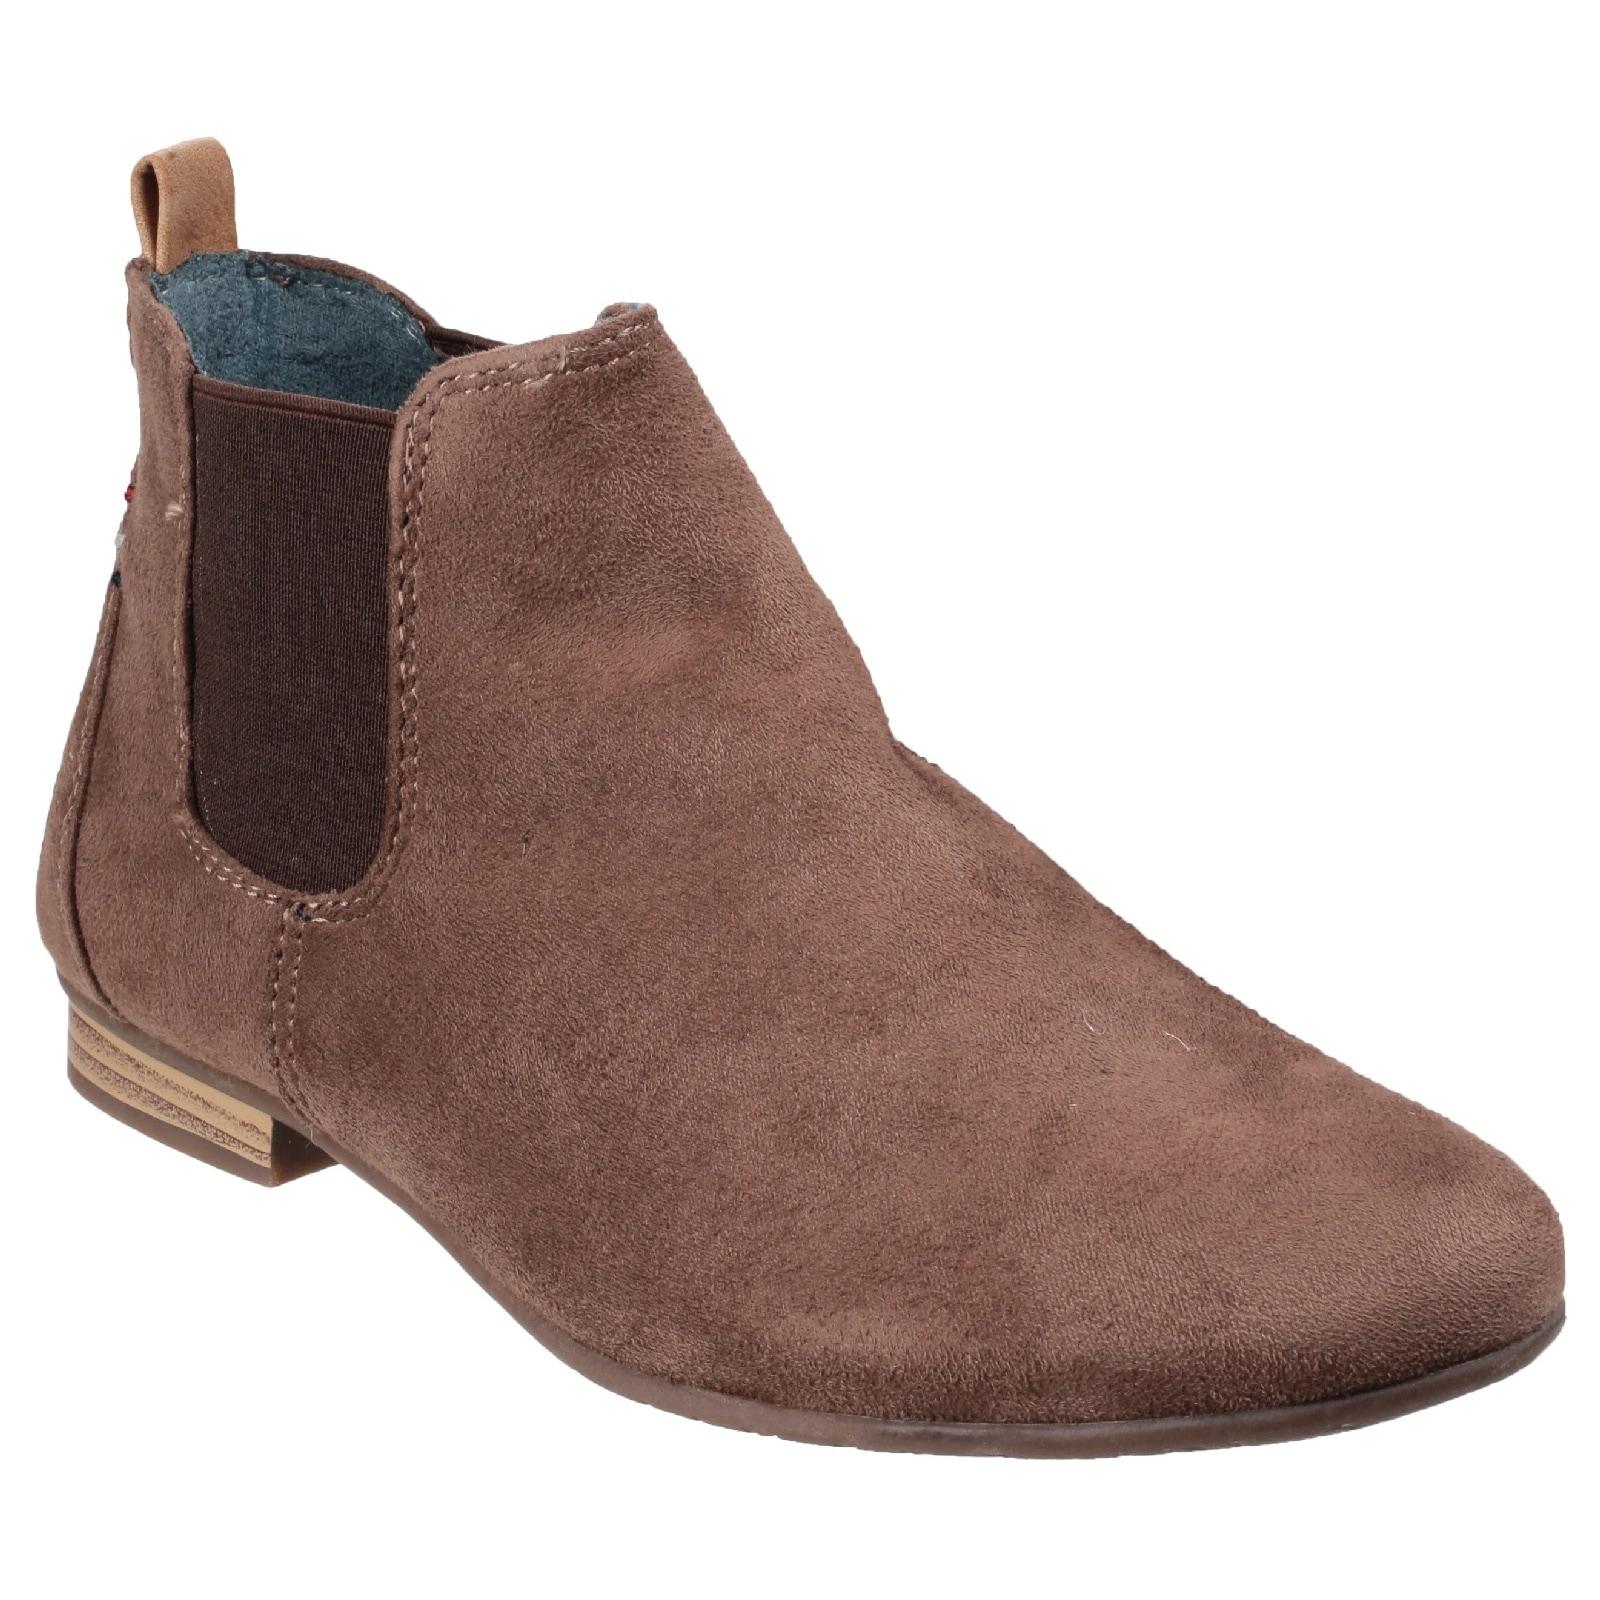 Image of Divaz Ankleboots »Damen Pisa Ankle-Boots«